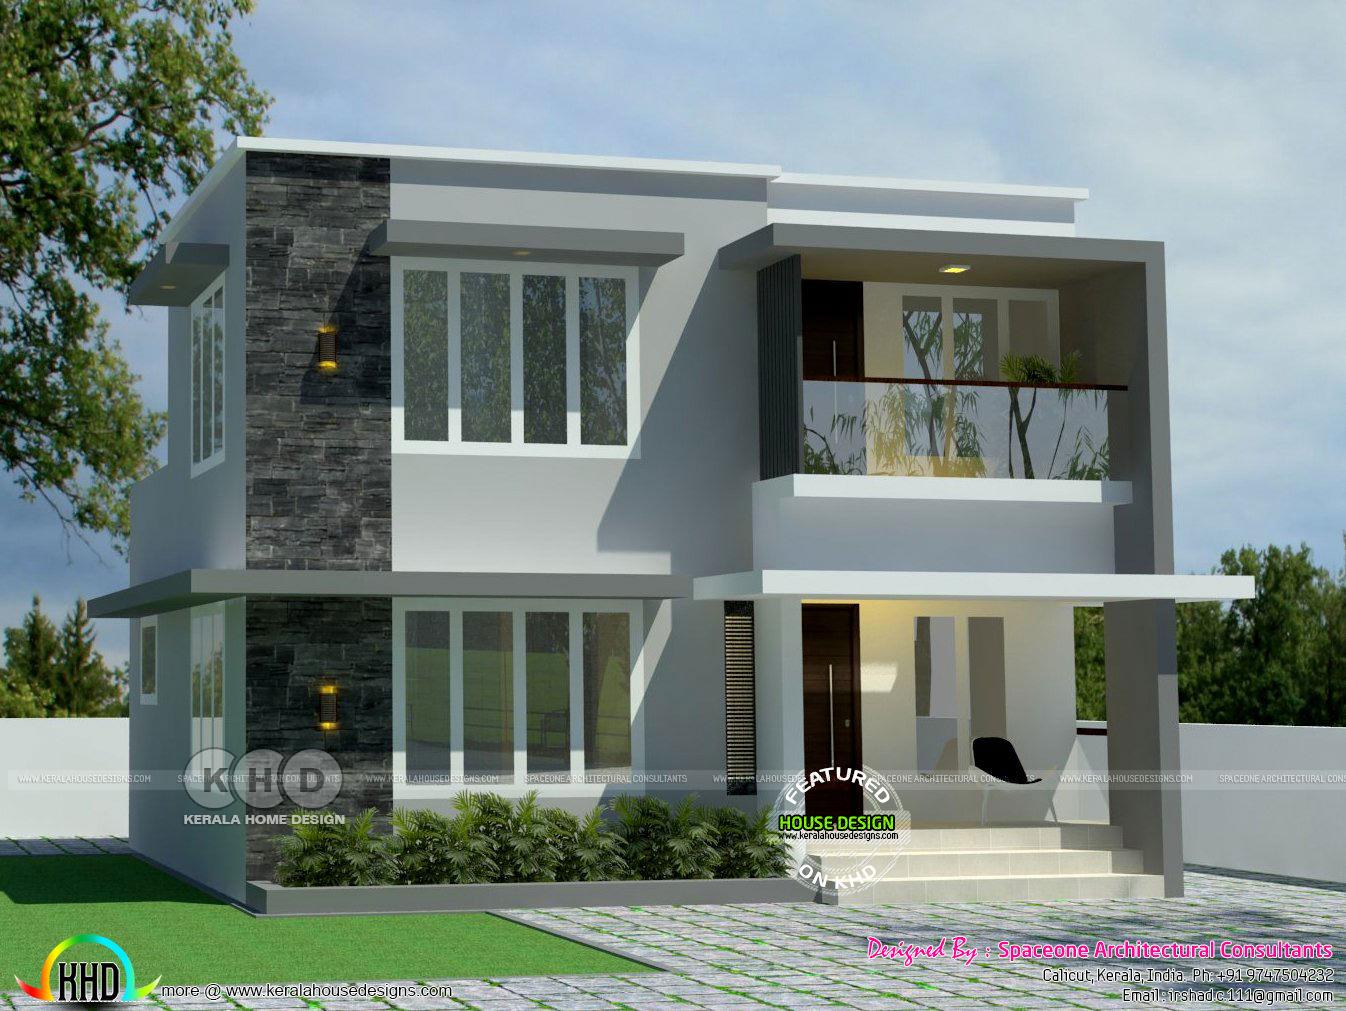 1200 sq-ft 4 bhk flat roof house plan - Kerala home design ...